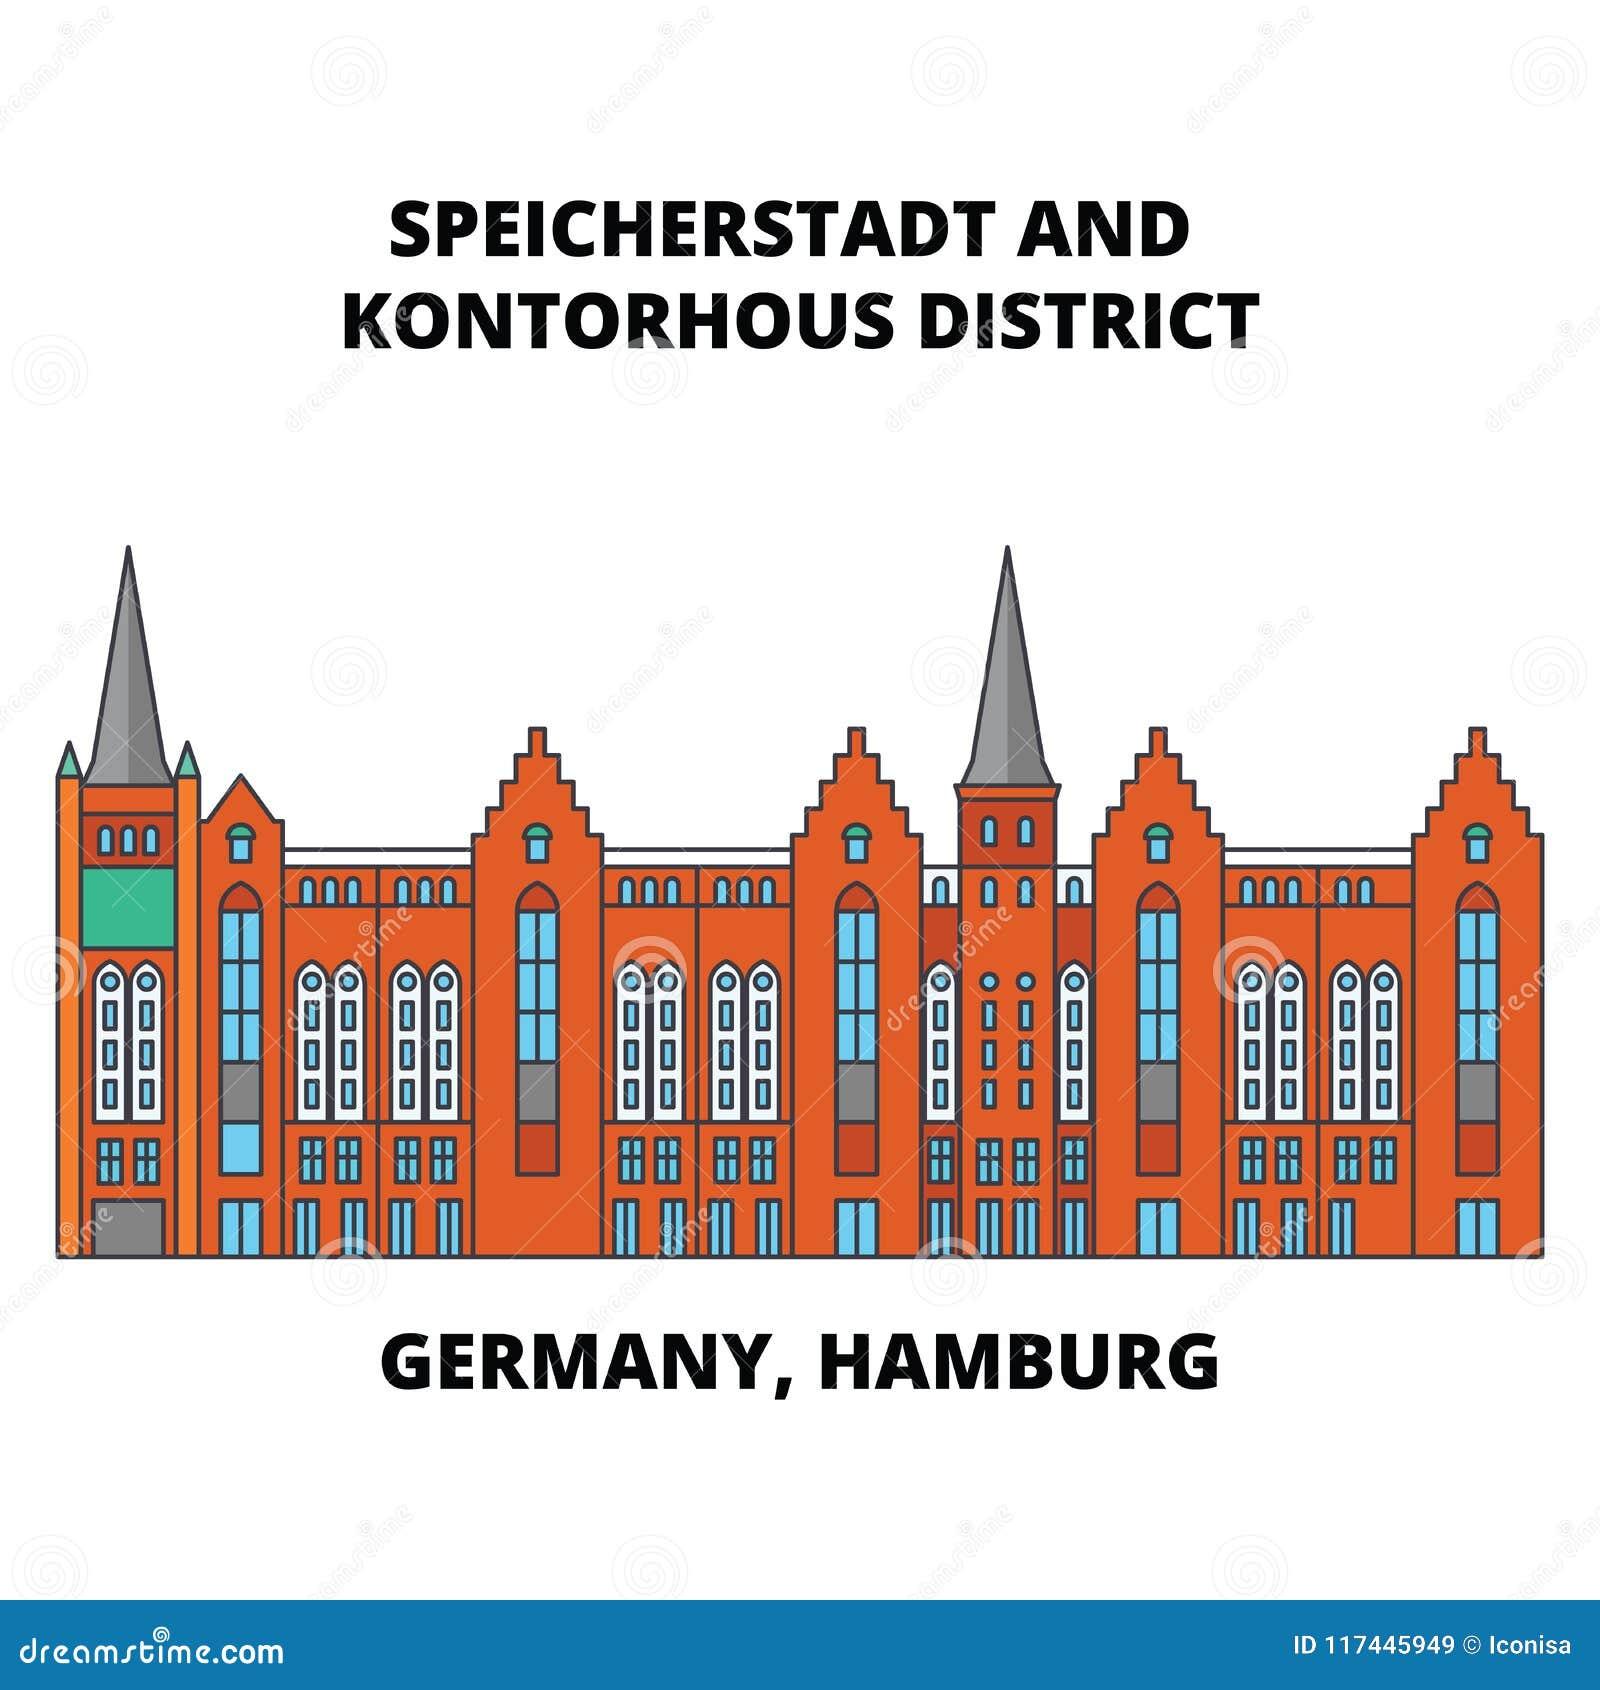 Government District Line Wiring Diagrams Colorsensorcircuit Light Sensor Circuitclick For Next Circuit Germany Hamburg Speicherstadt Icon Concept Rh Dreamstime Com Dc In Kansas City Mo